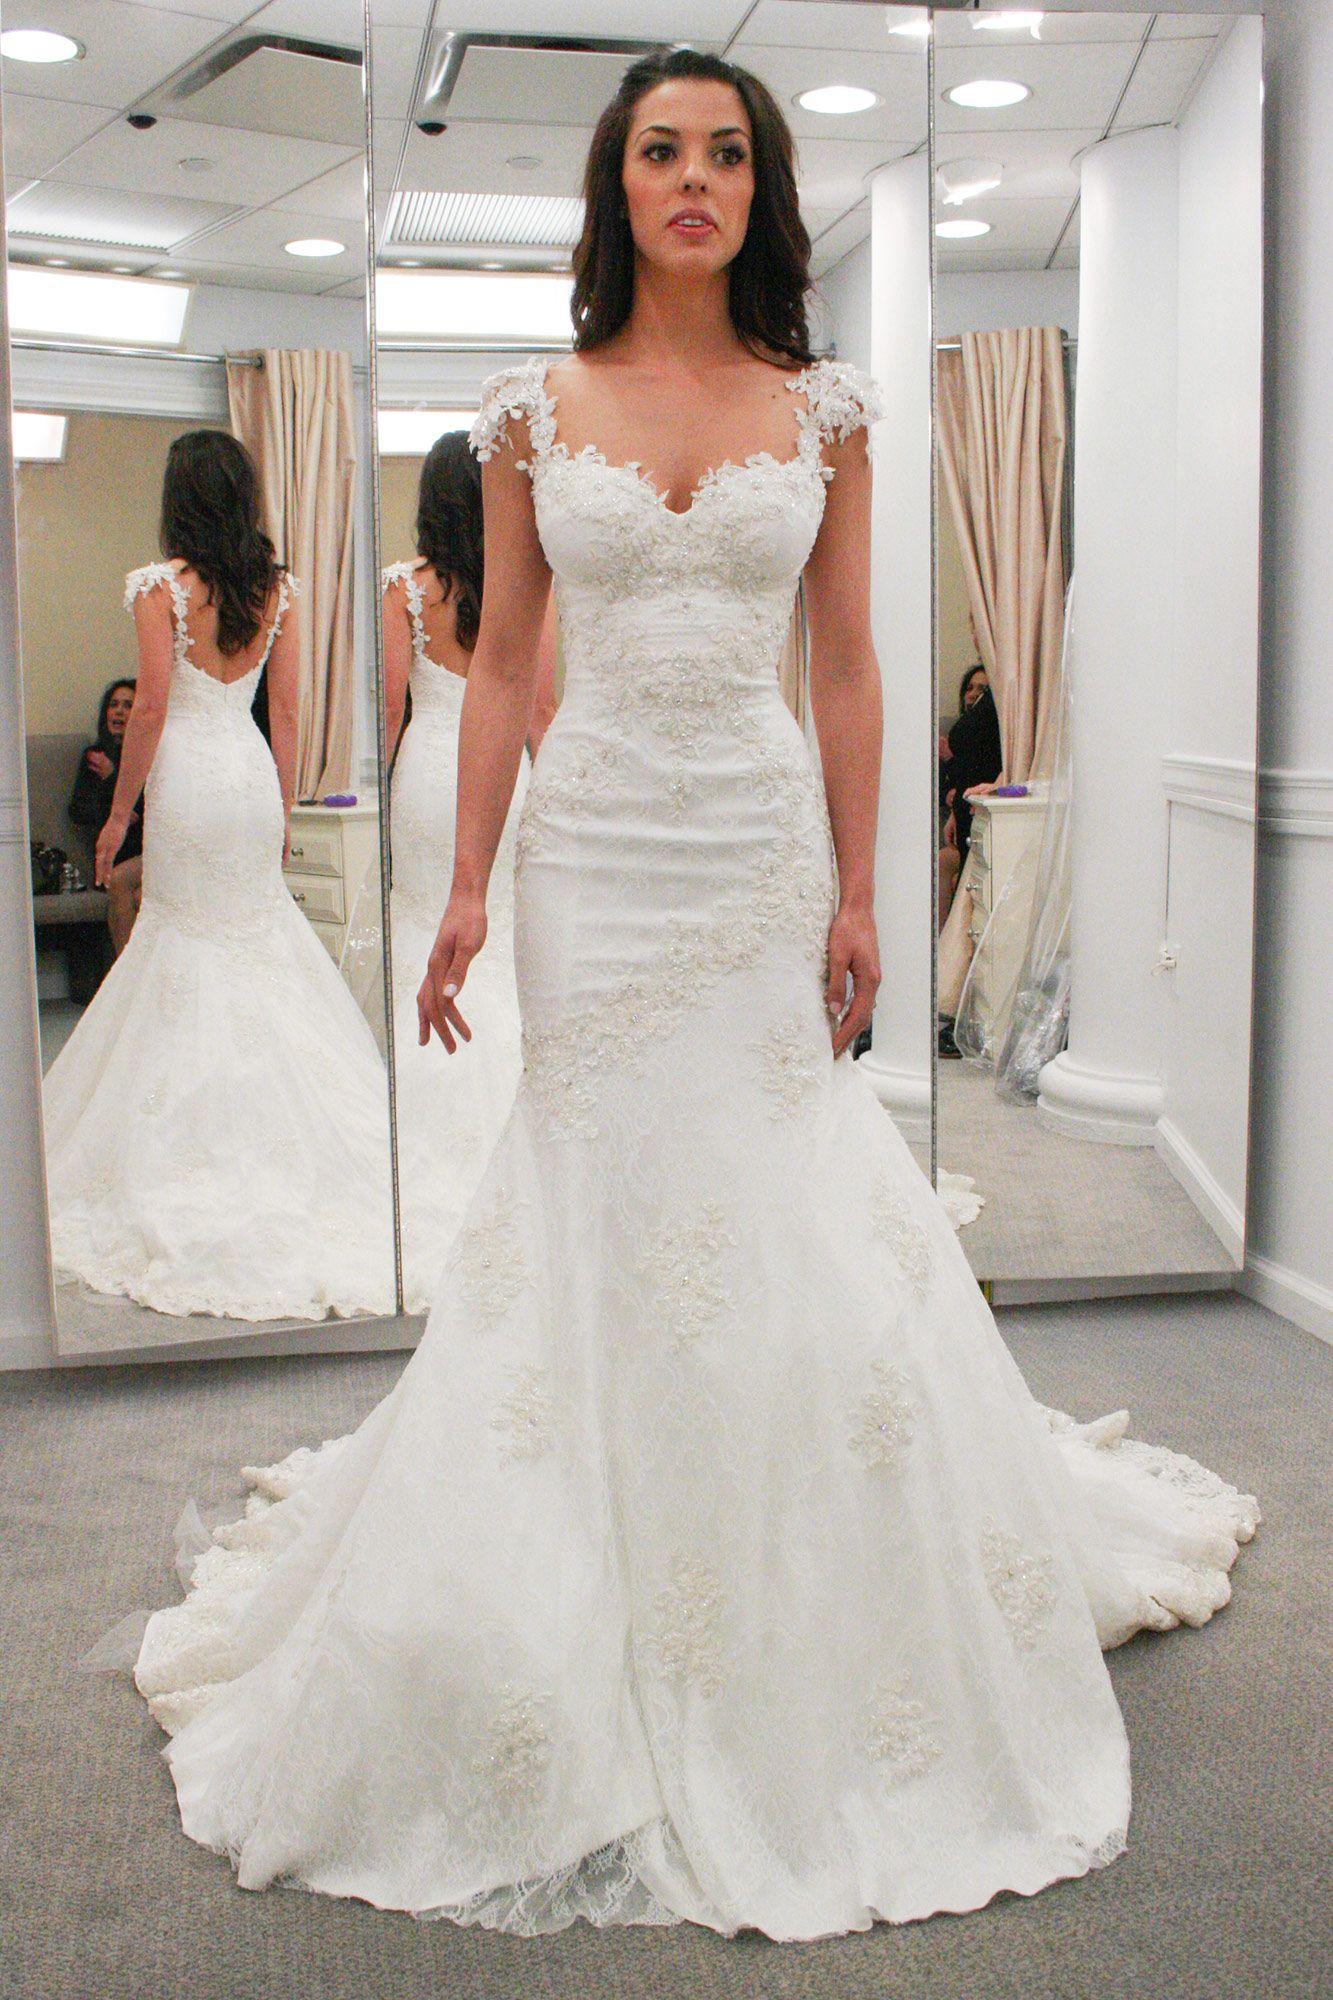 Westfield wedding dress  Dijana Saleš dijouro on Pinterest